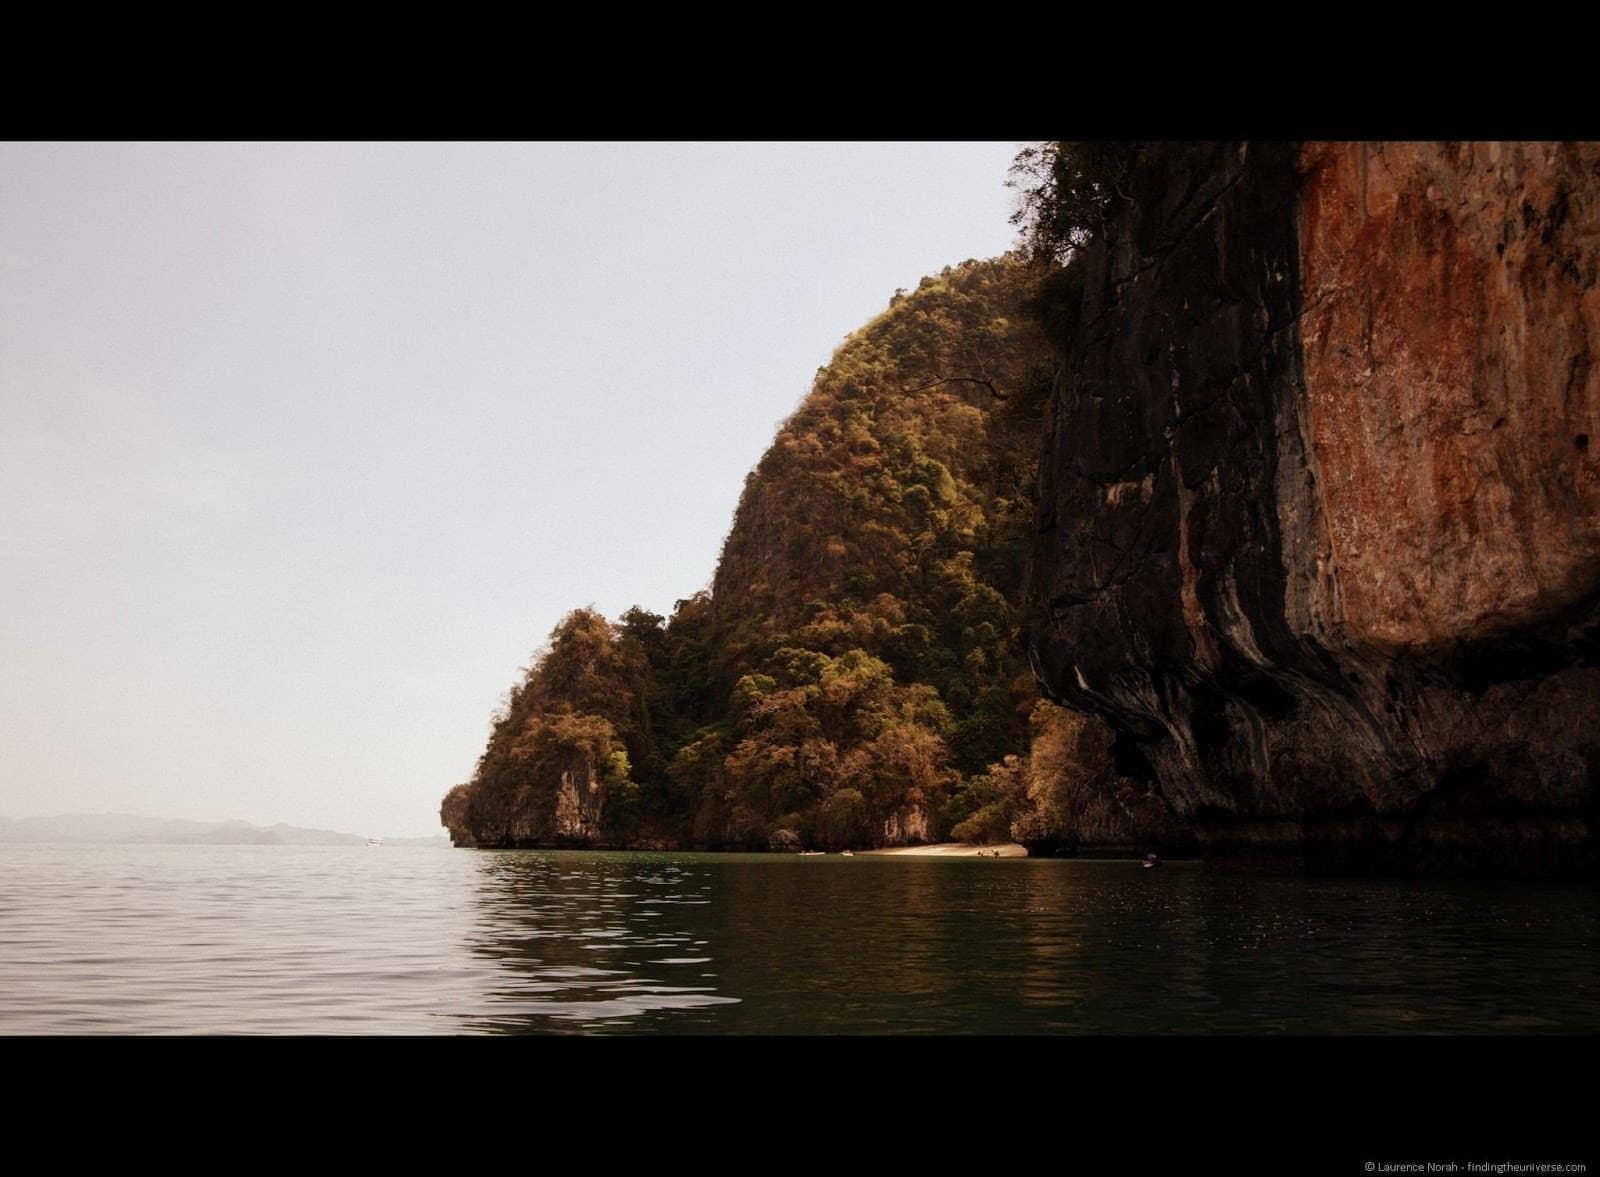 Canoeing get your guide Phang Nga James Bond Thailand